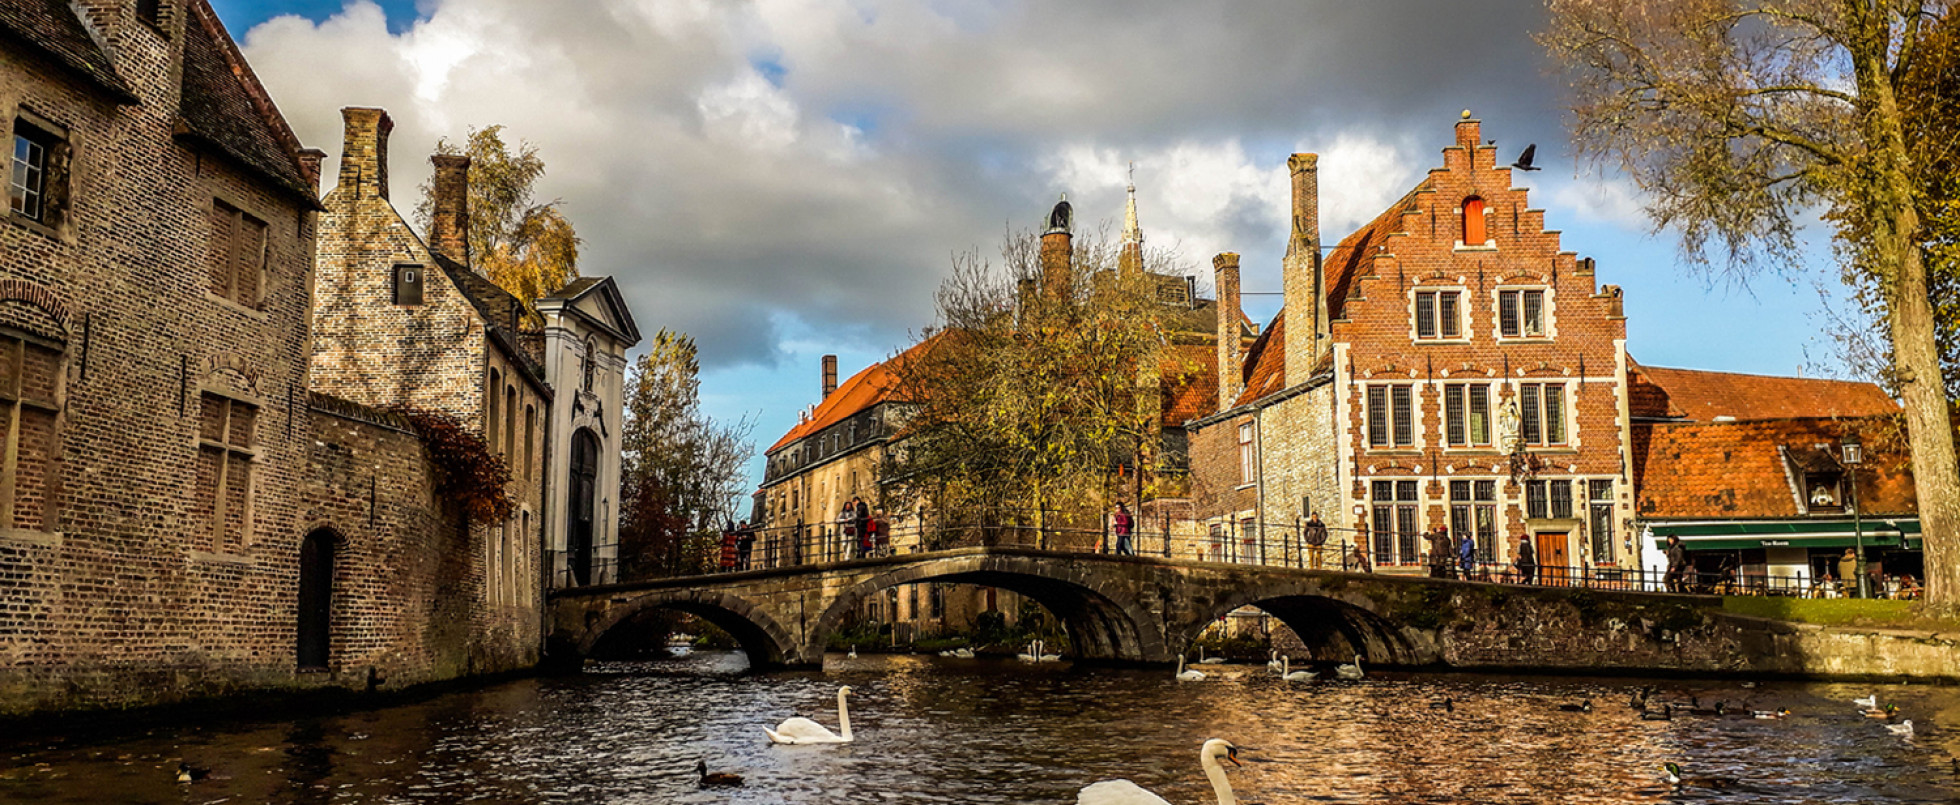 City of Bruges, Belgium: In Bruges